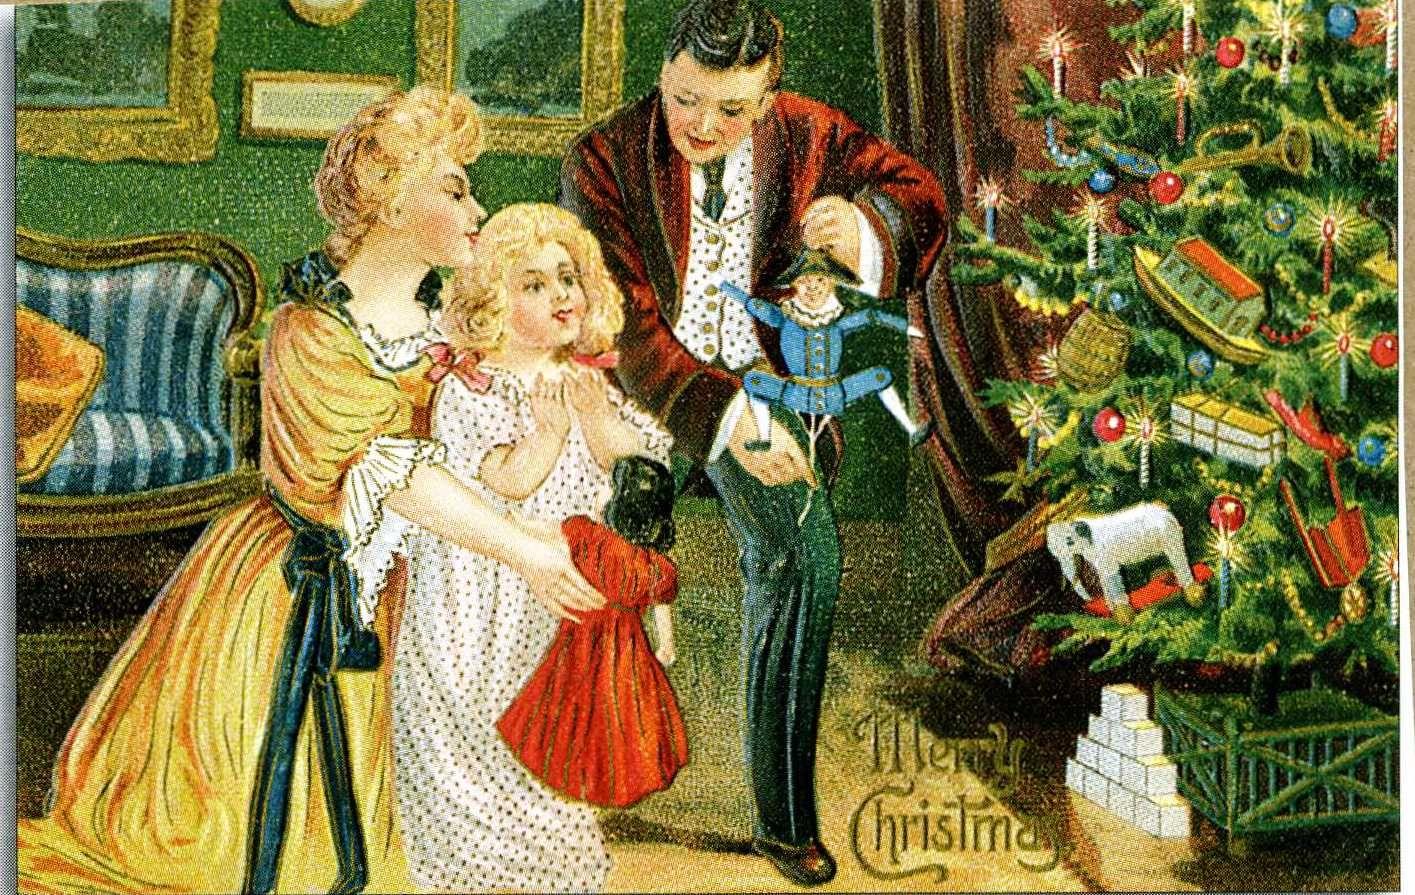 vintage christmas images free download